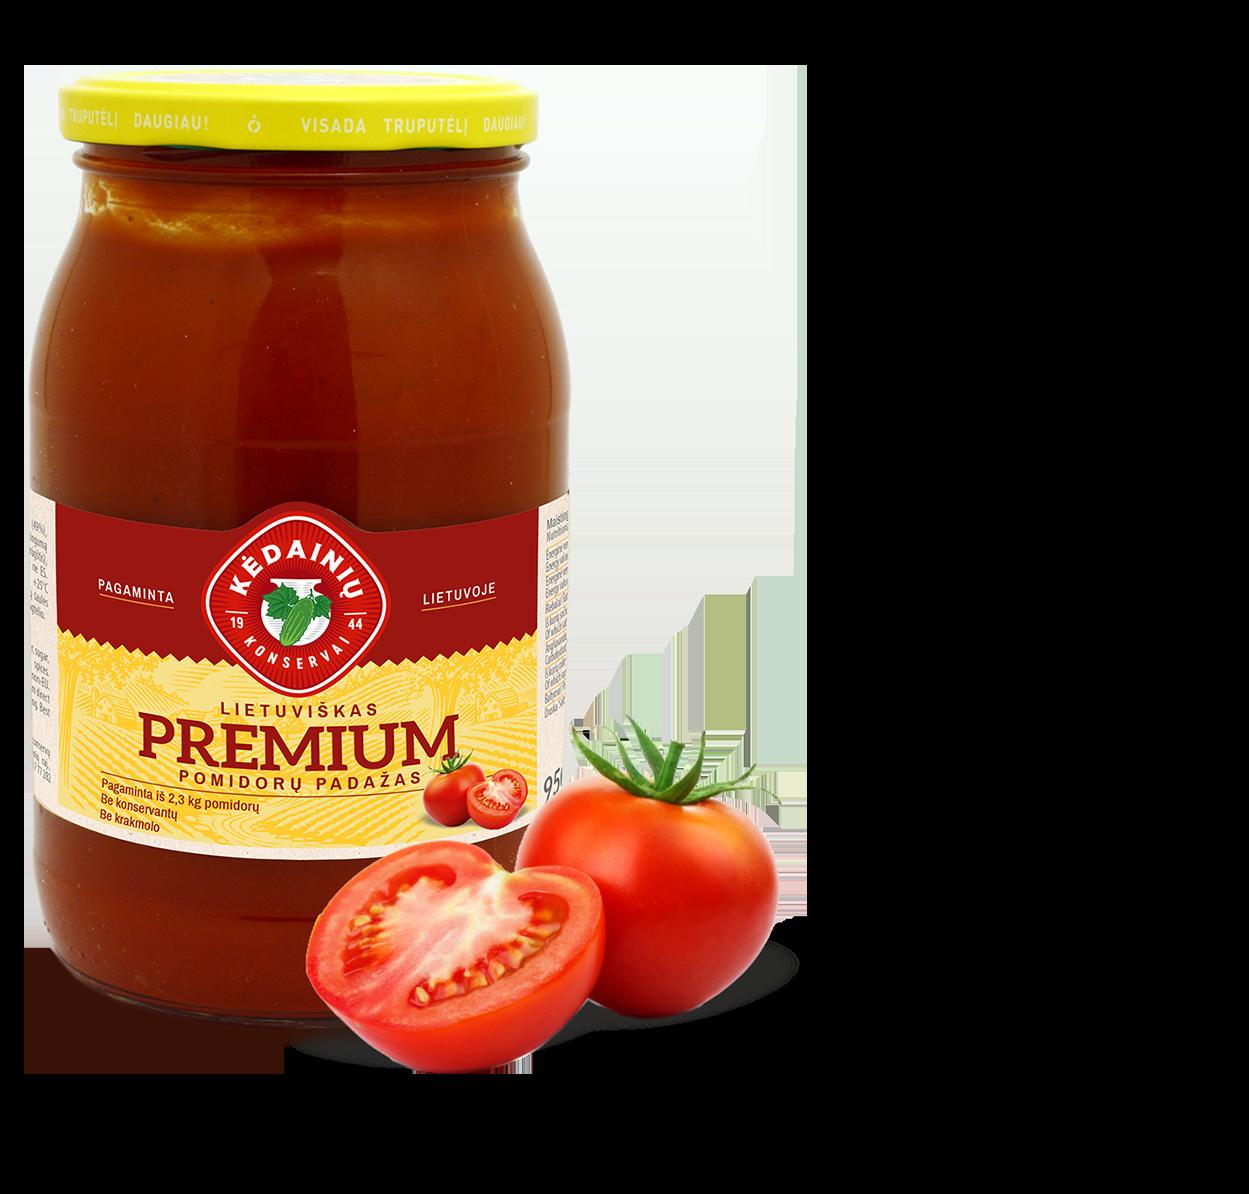 Premium lietuviškas